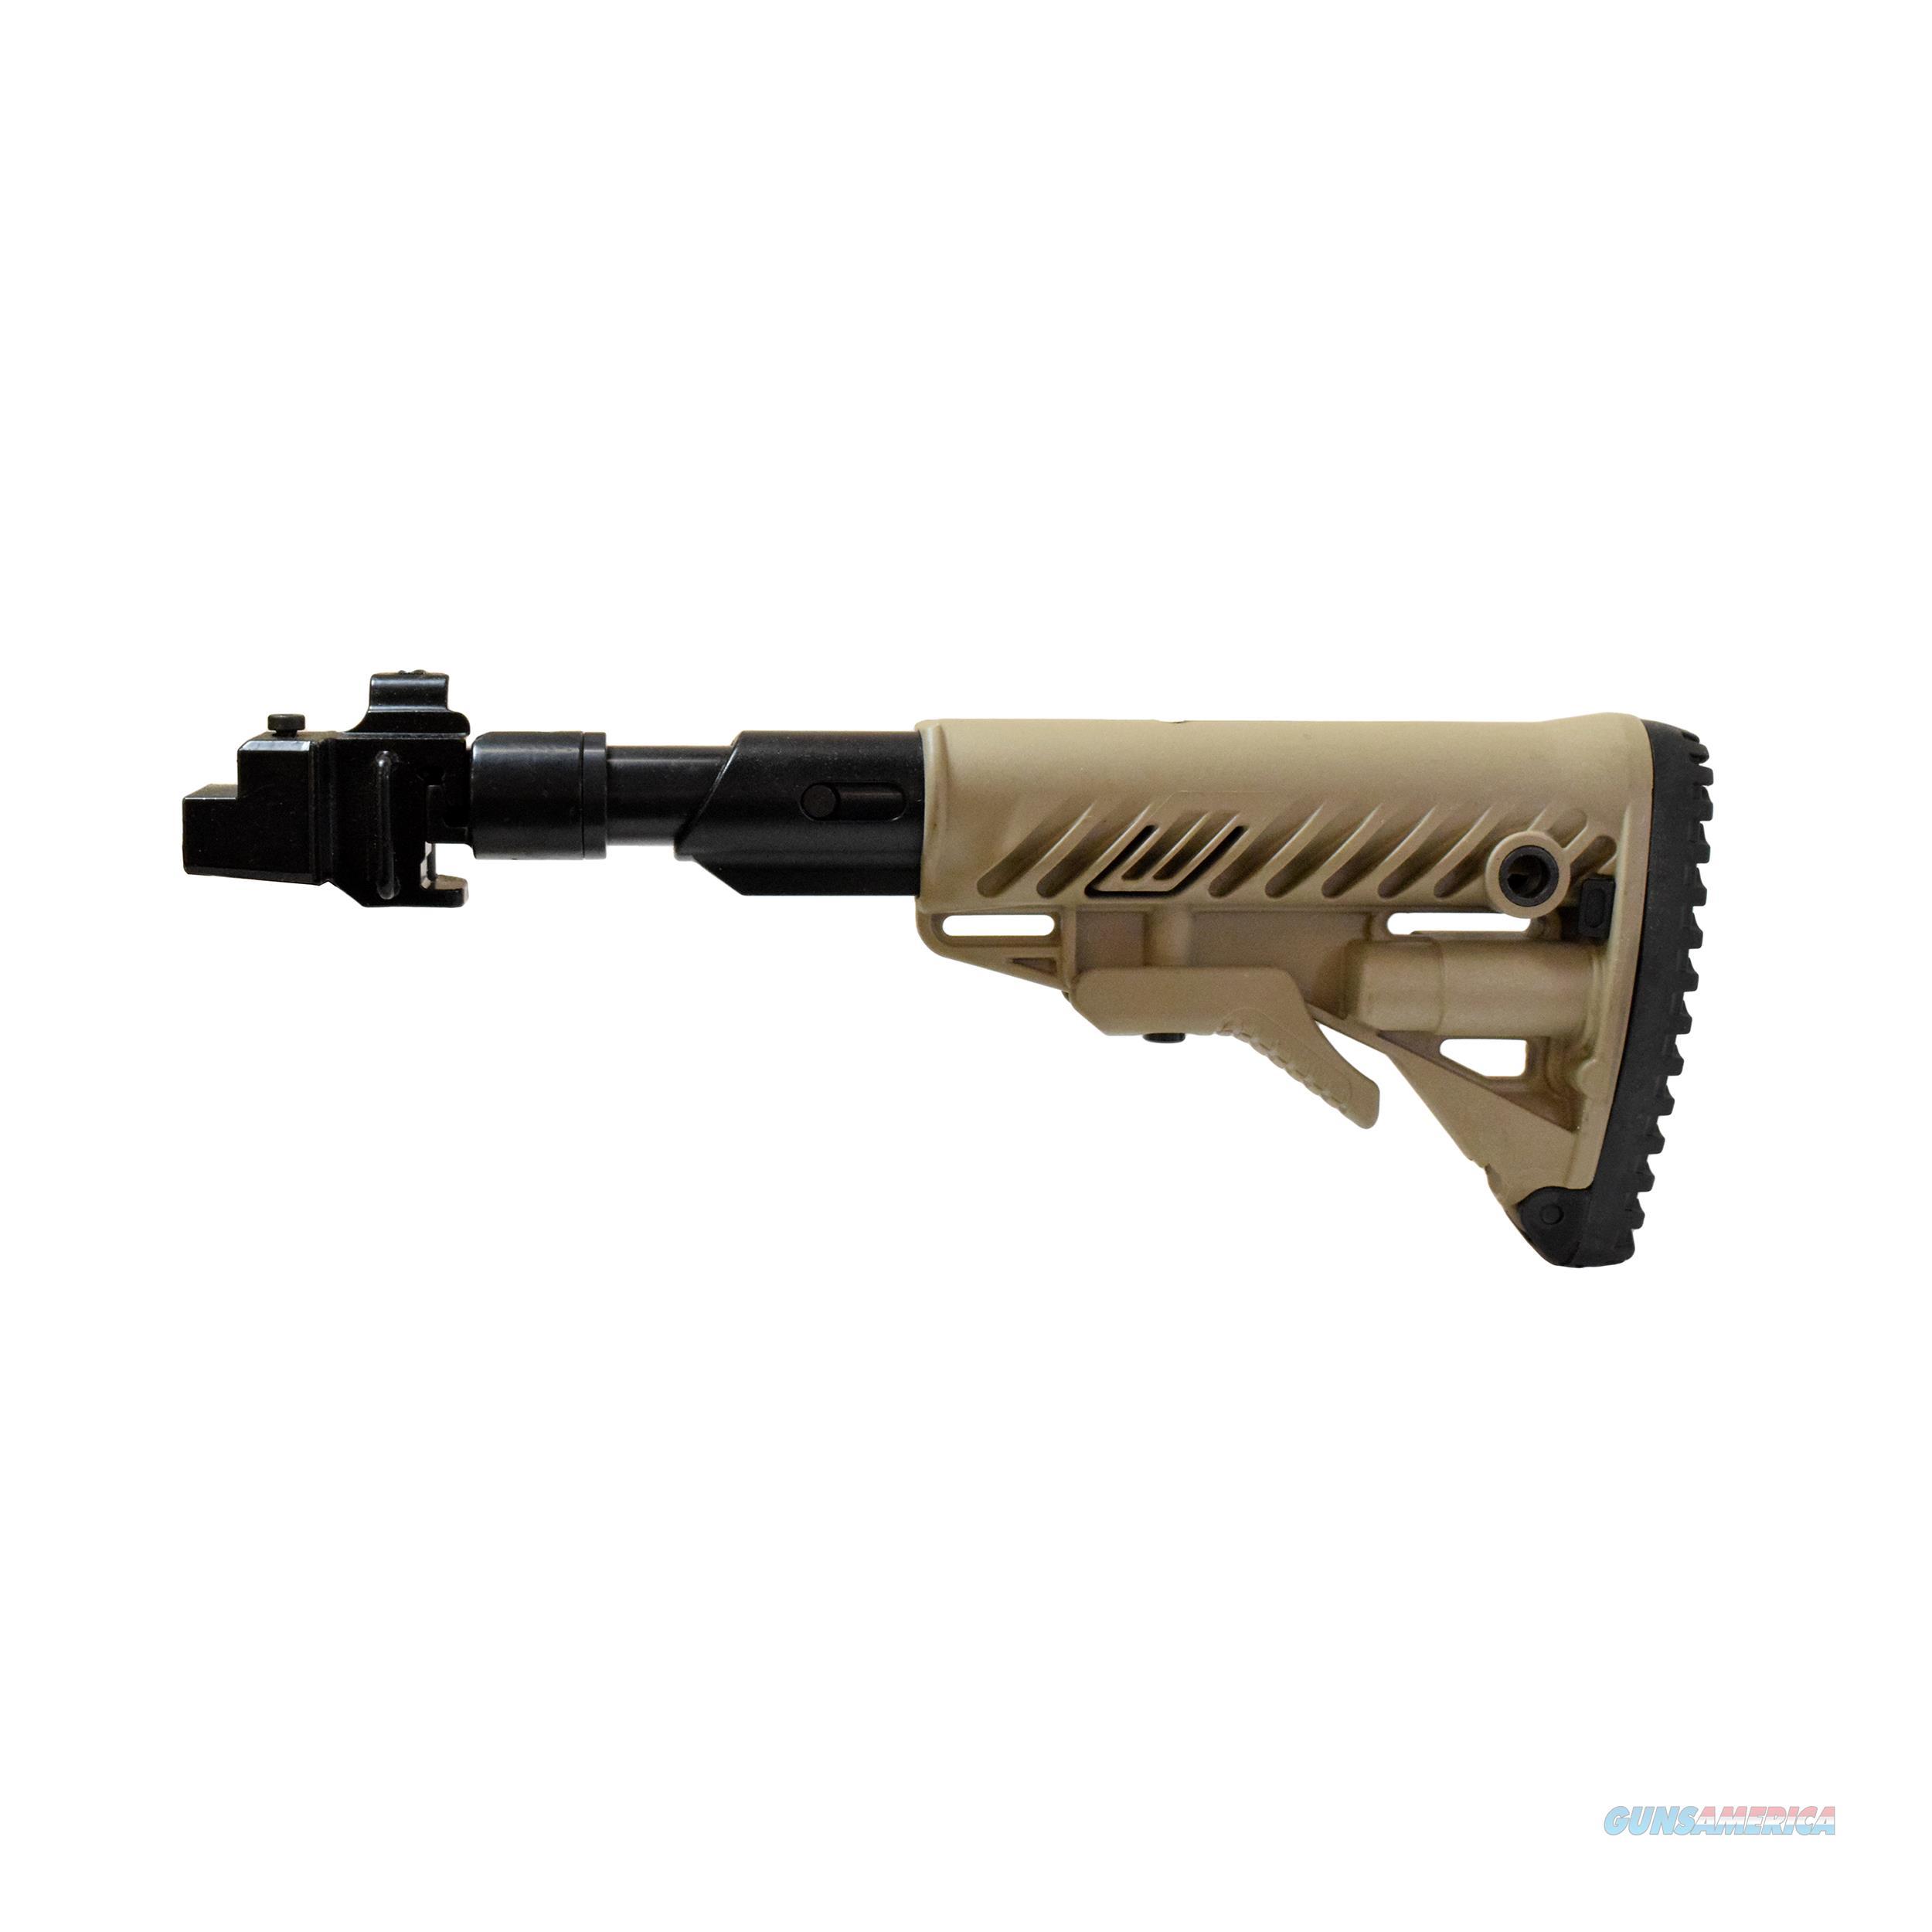 Mako Group Galil Style Recoil Compensation Folding Collapsible Buttstock System M4AK SB-FDE  Non-Guns > Gunstocks, Grips & Wood